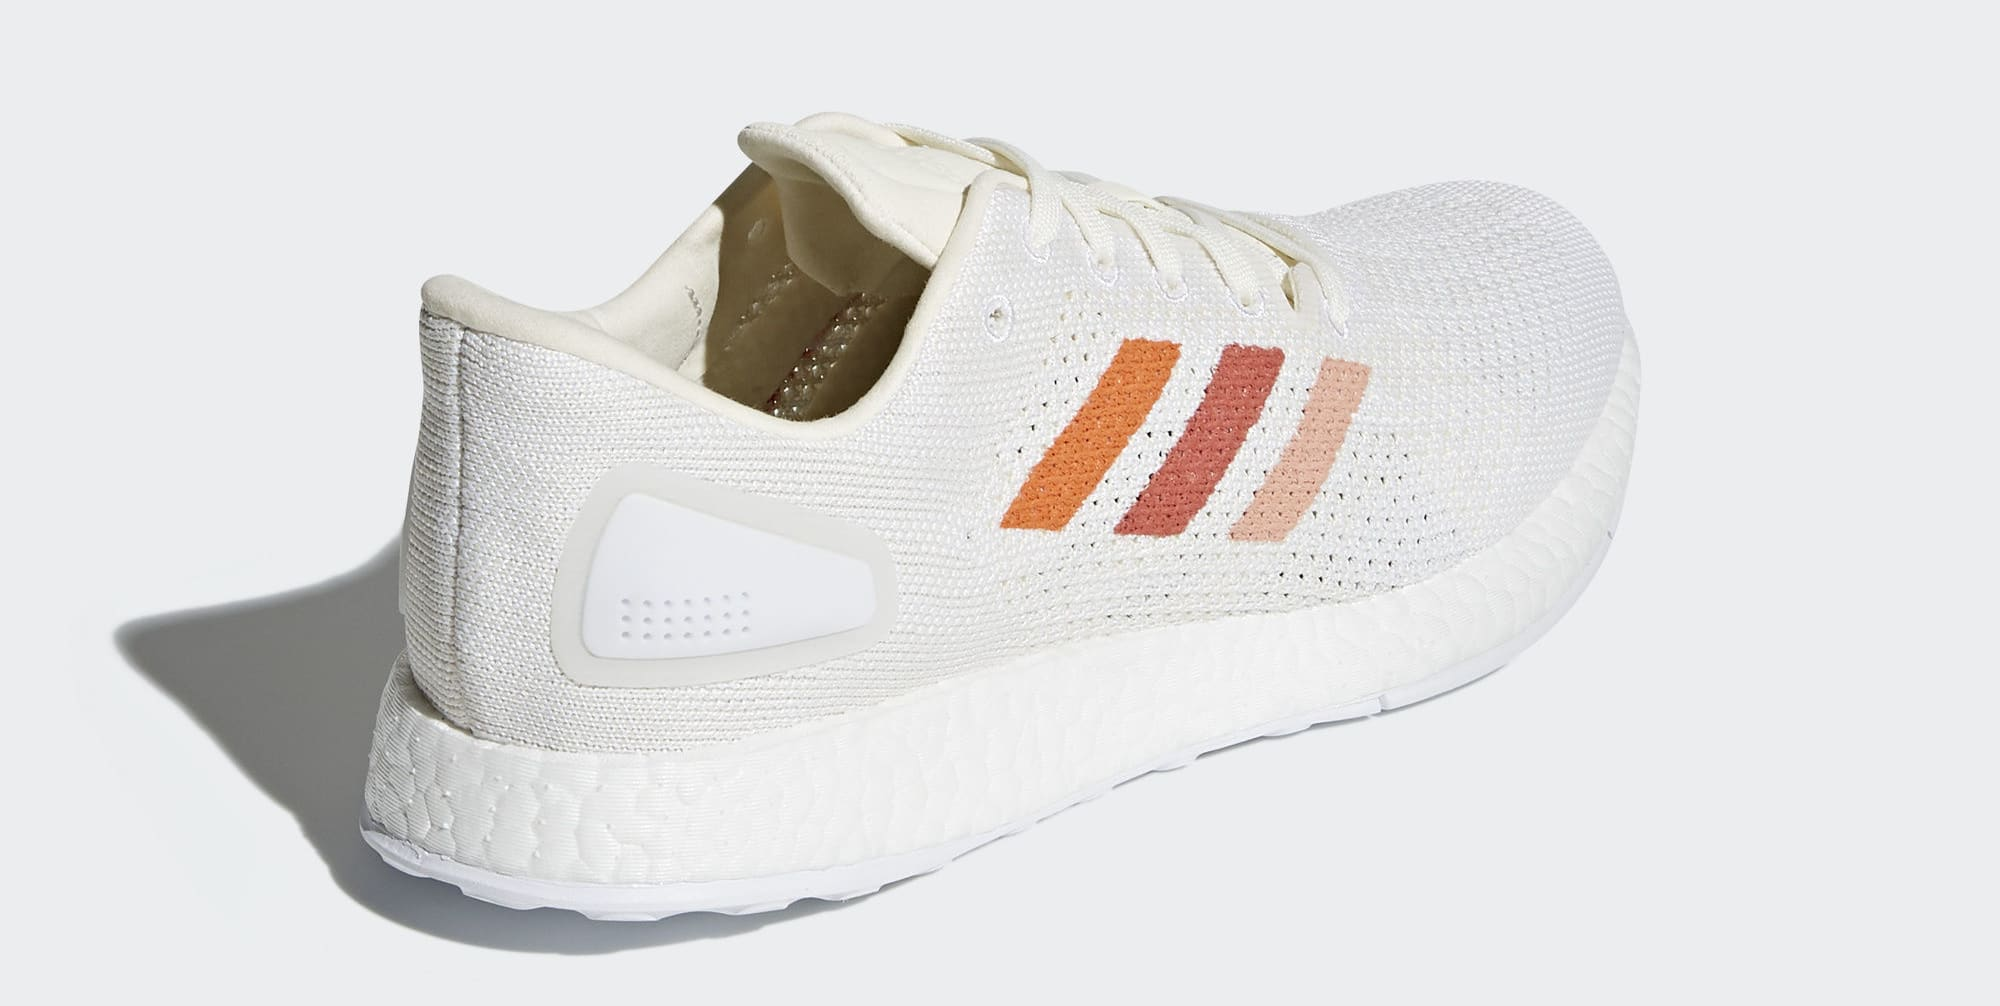 Adidas Pure Boost DPR 'Pride' B44878 (Heel)